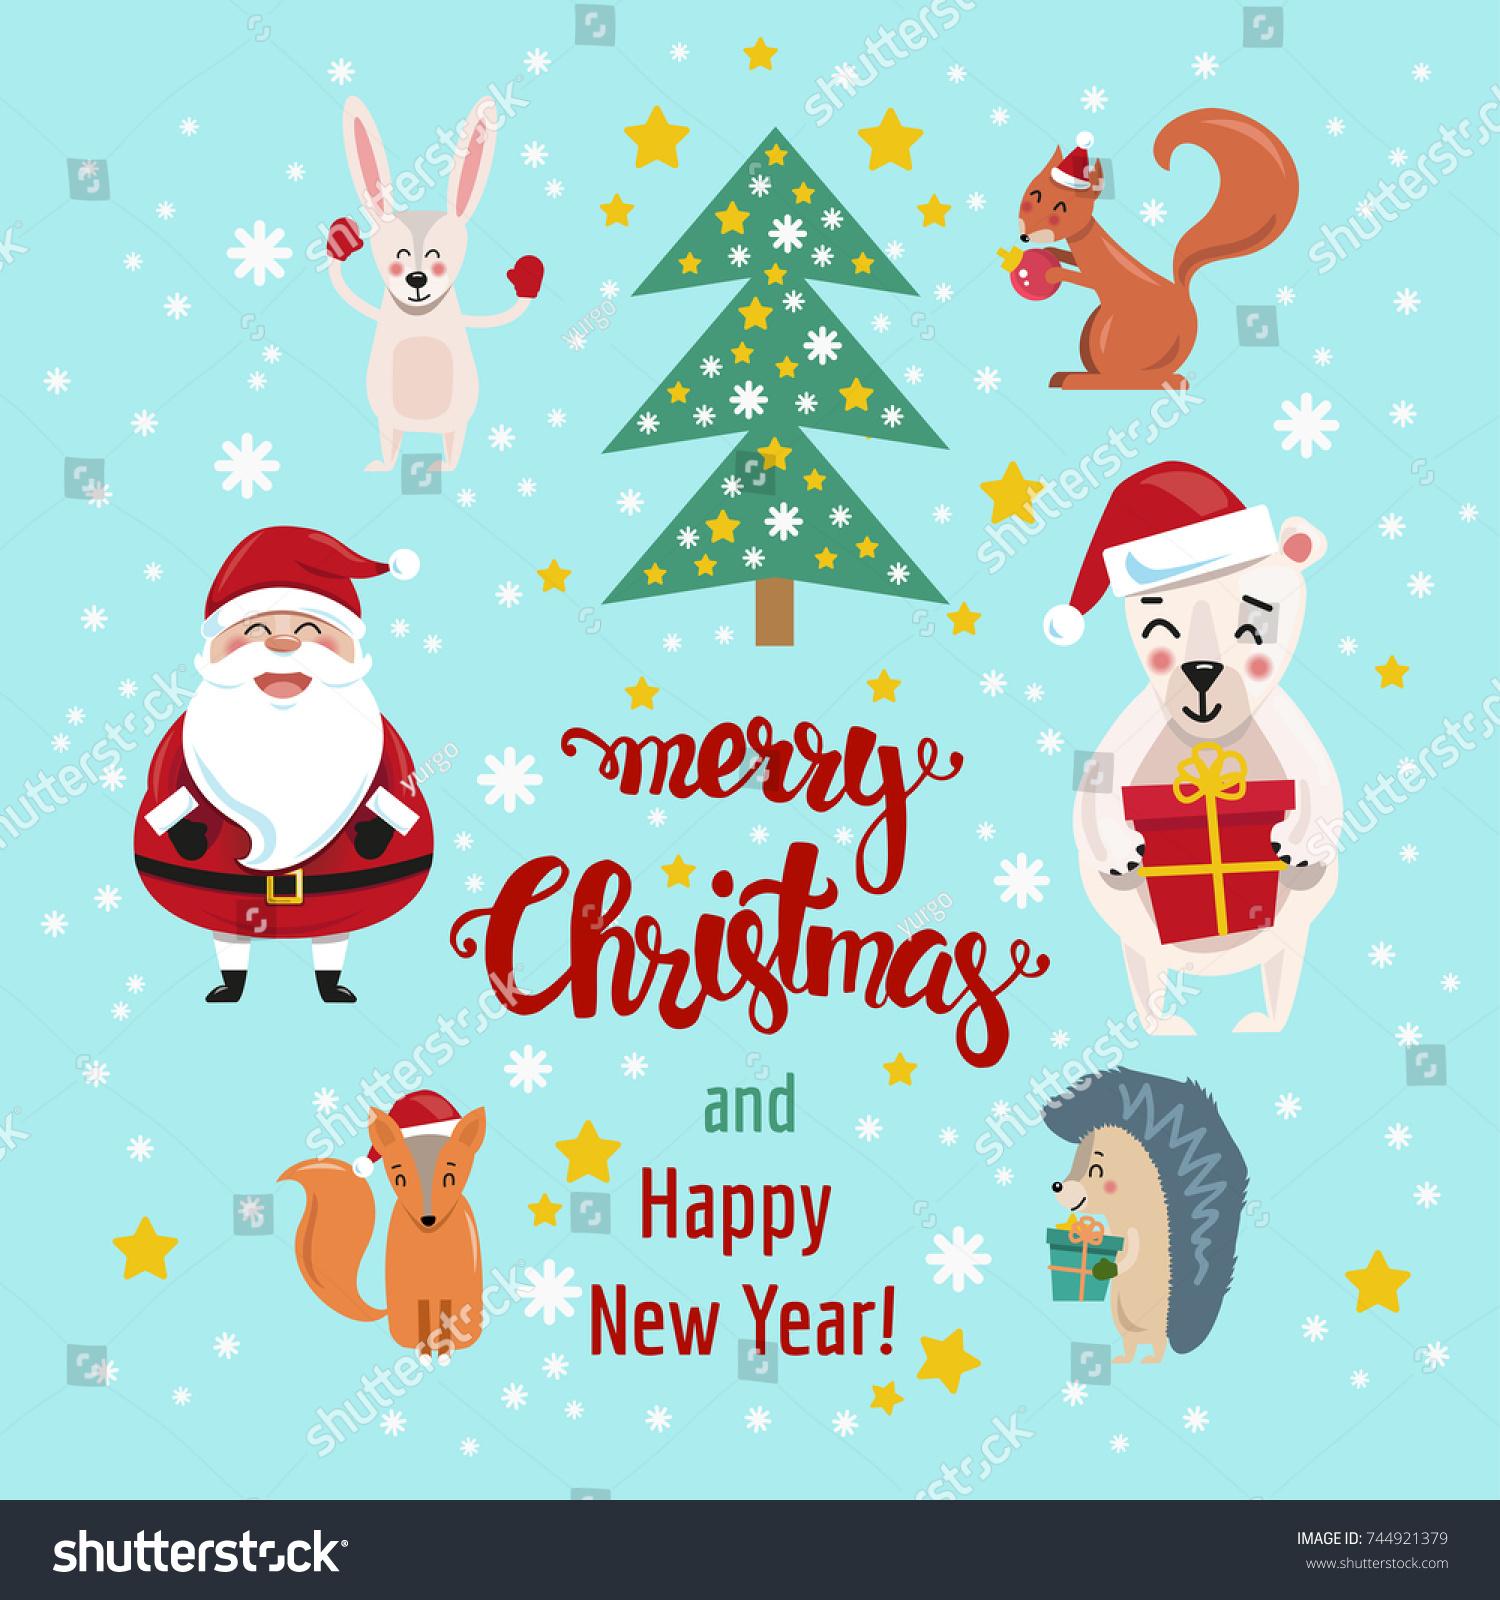 Merry Christmas Christmas Greetings Cute Happy Stock Vector Royalty